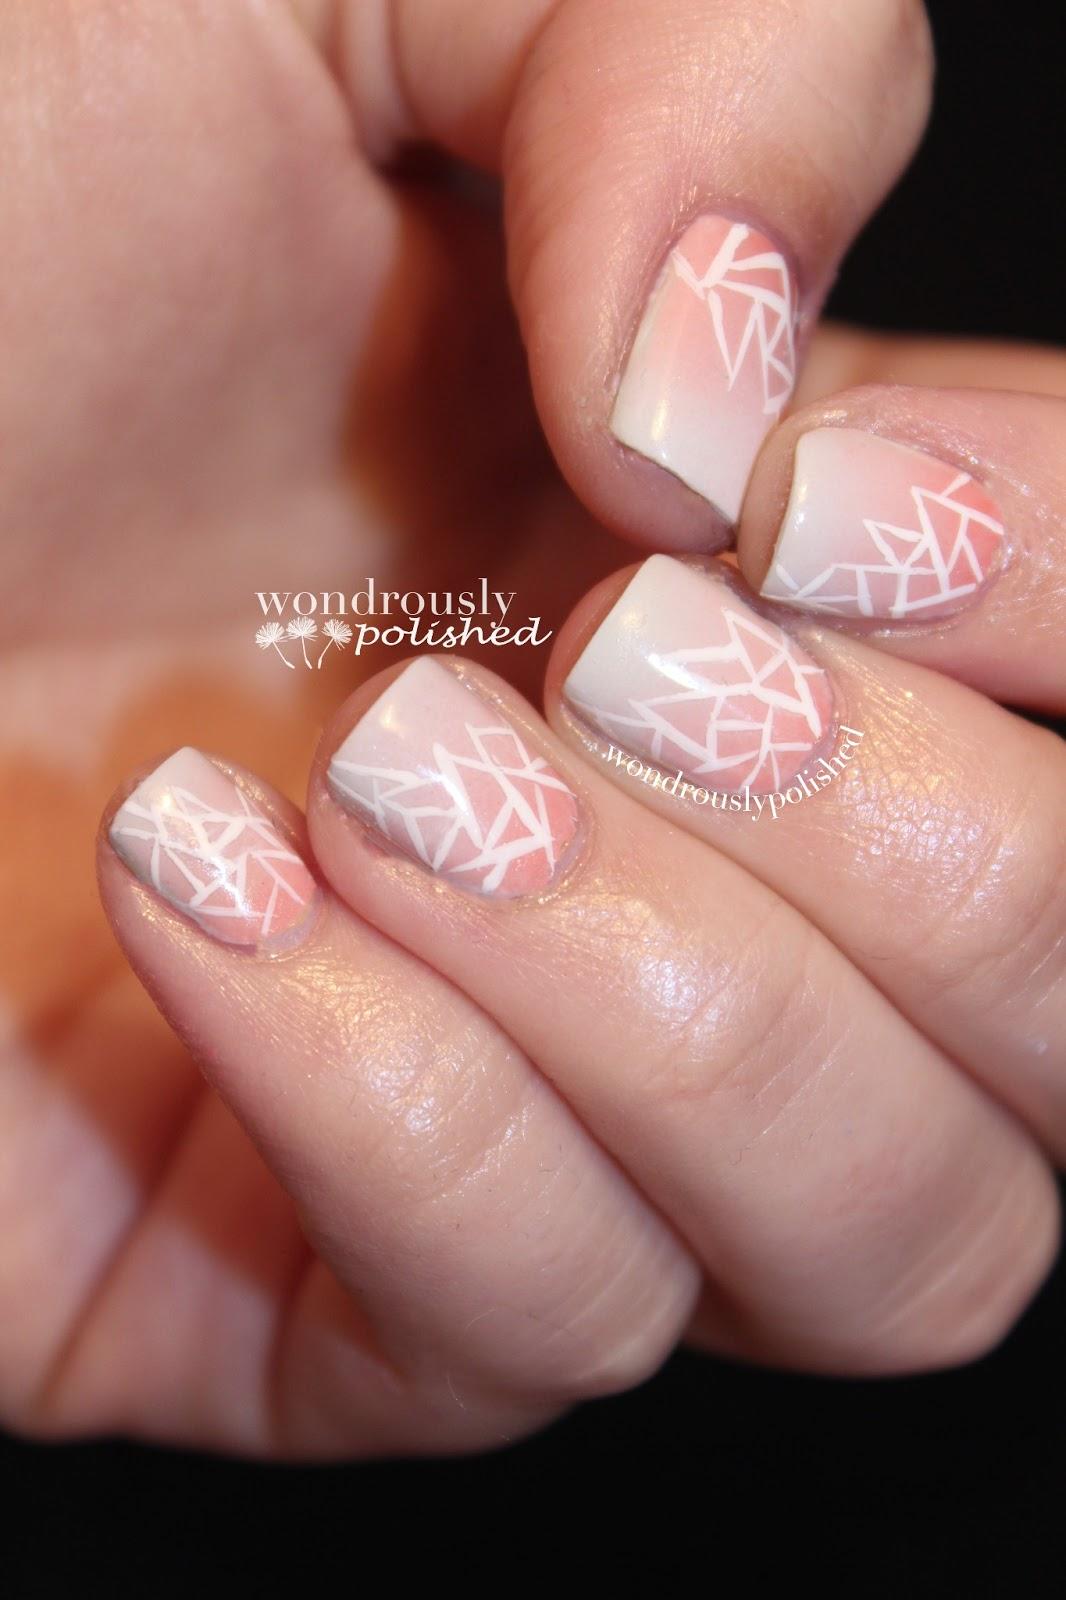 Wondrously Polished: March Nail Art Challenge - Day 3 ...